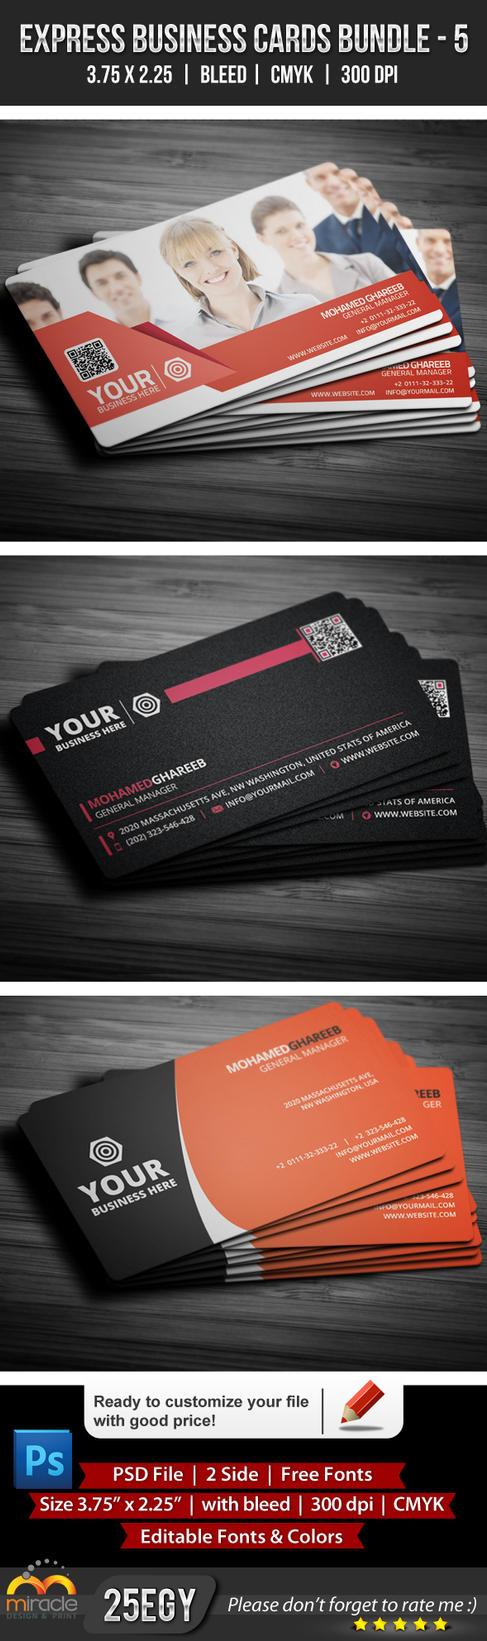 Express Business Cards Bundle 5 by EgYpToS on deviantART